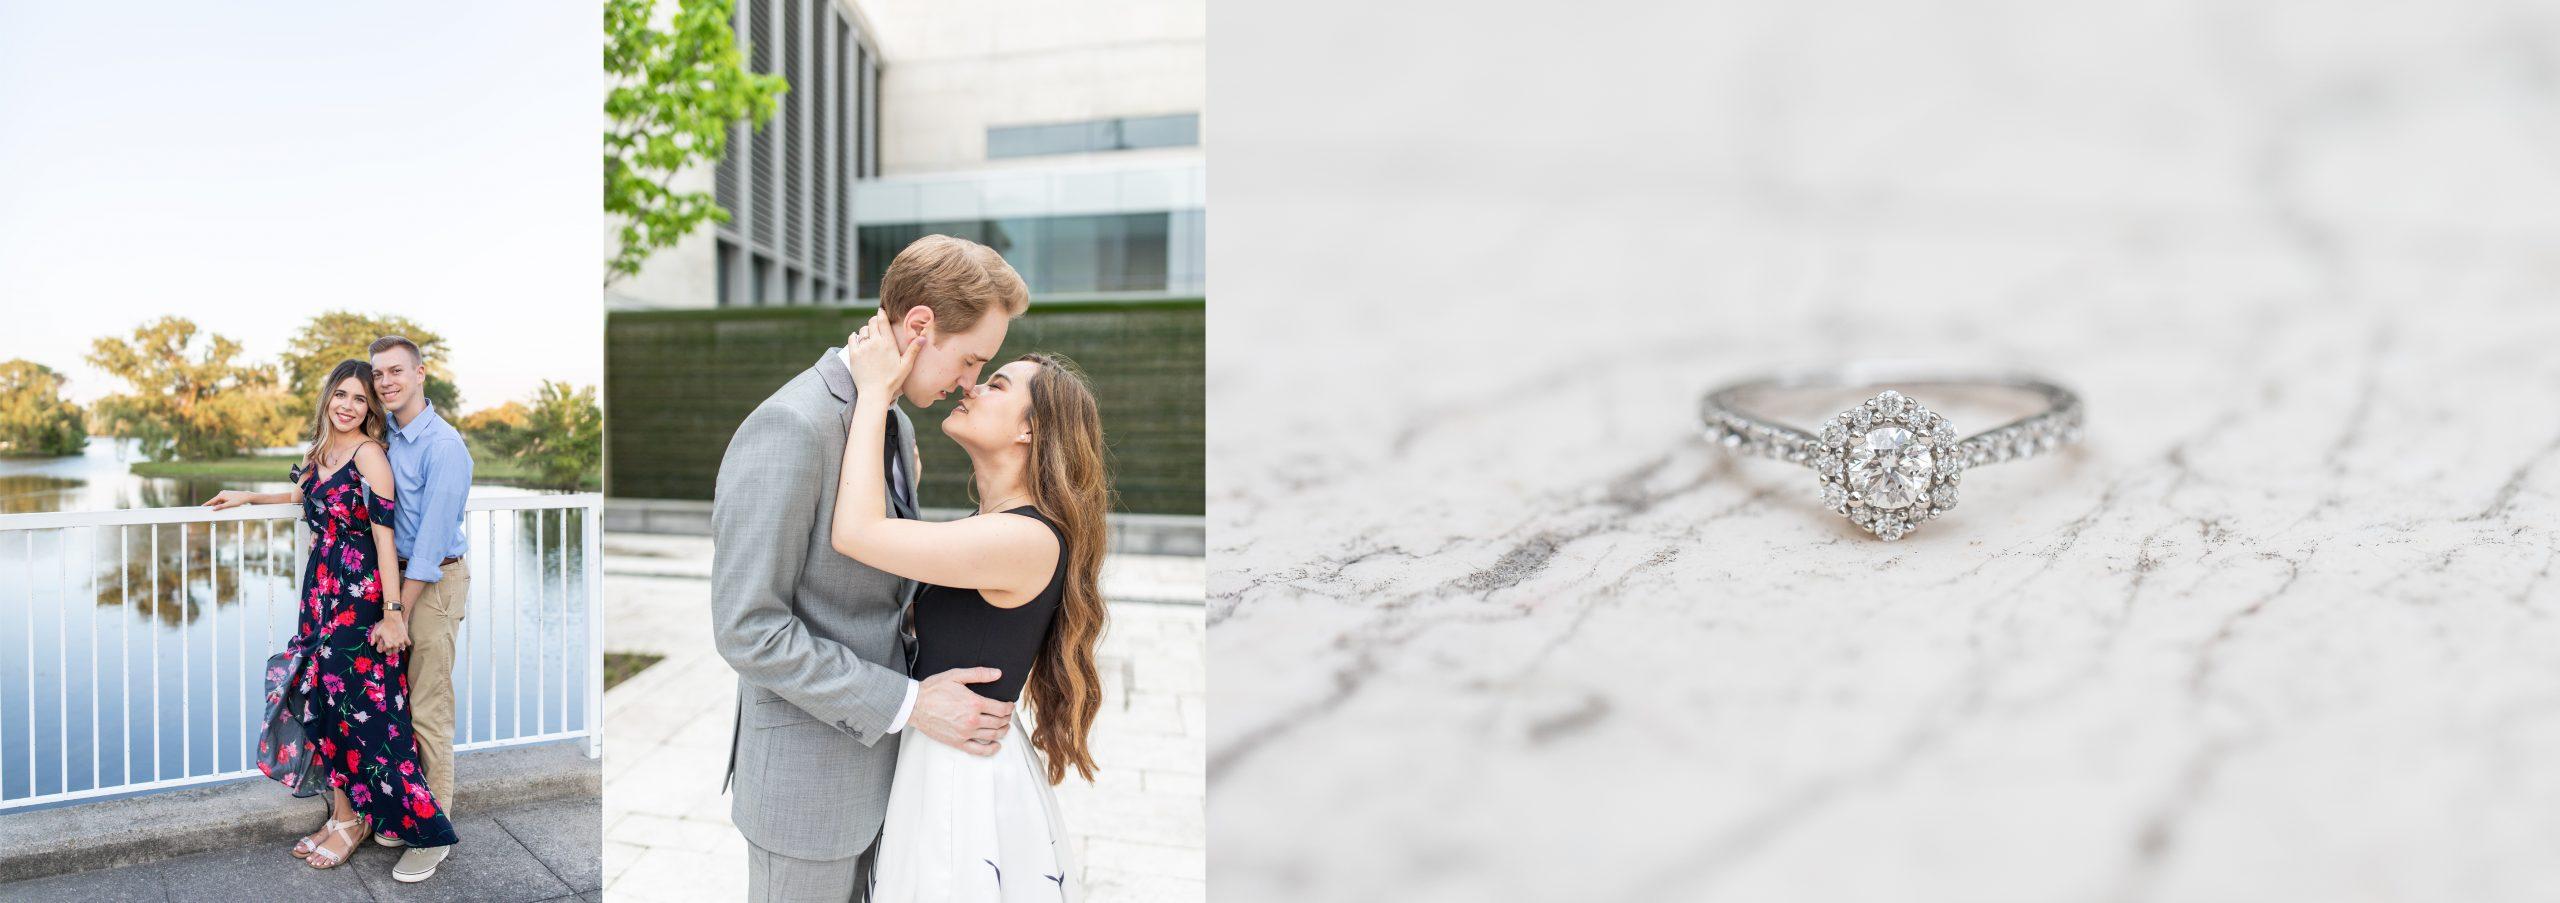 kandra-lynn-photography-wedding-photographer-03